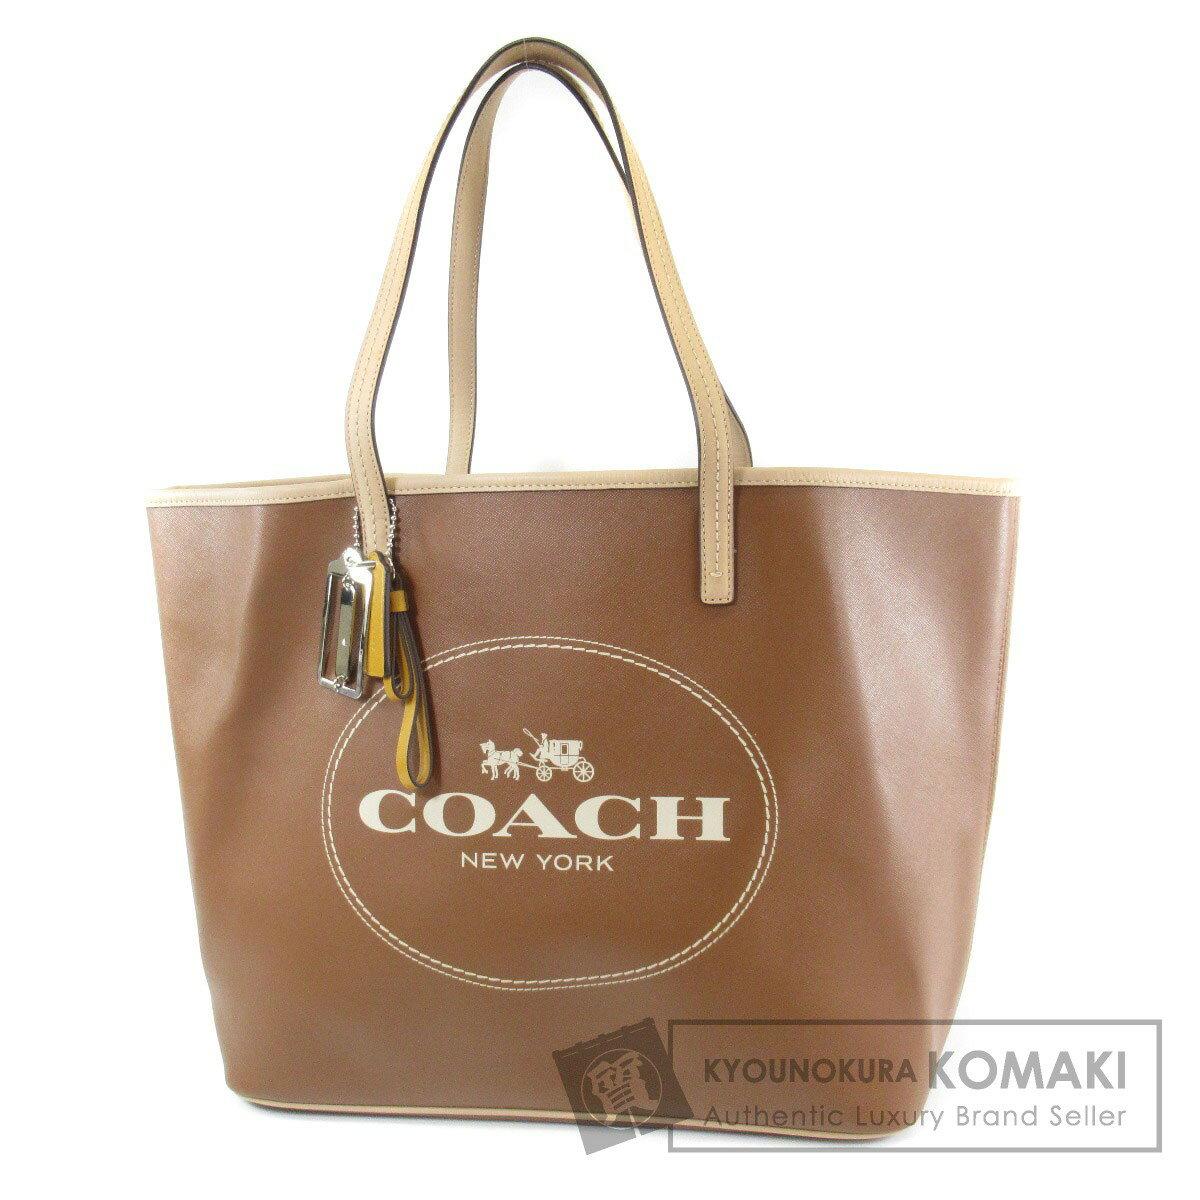 COACH F31315 トートバッグ PVC レディース 【中古】【コーチ】